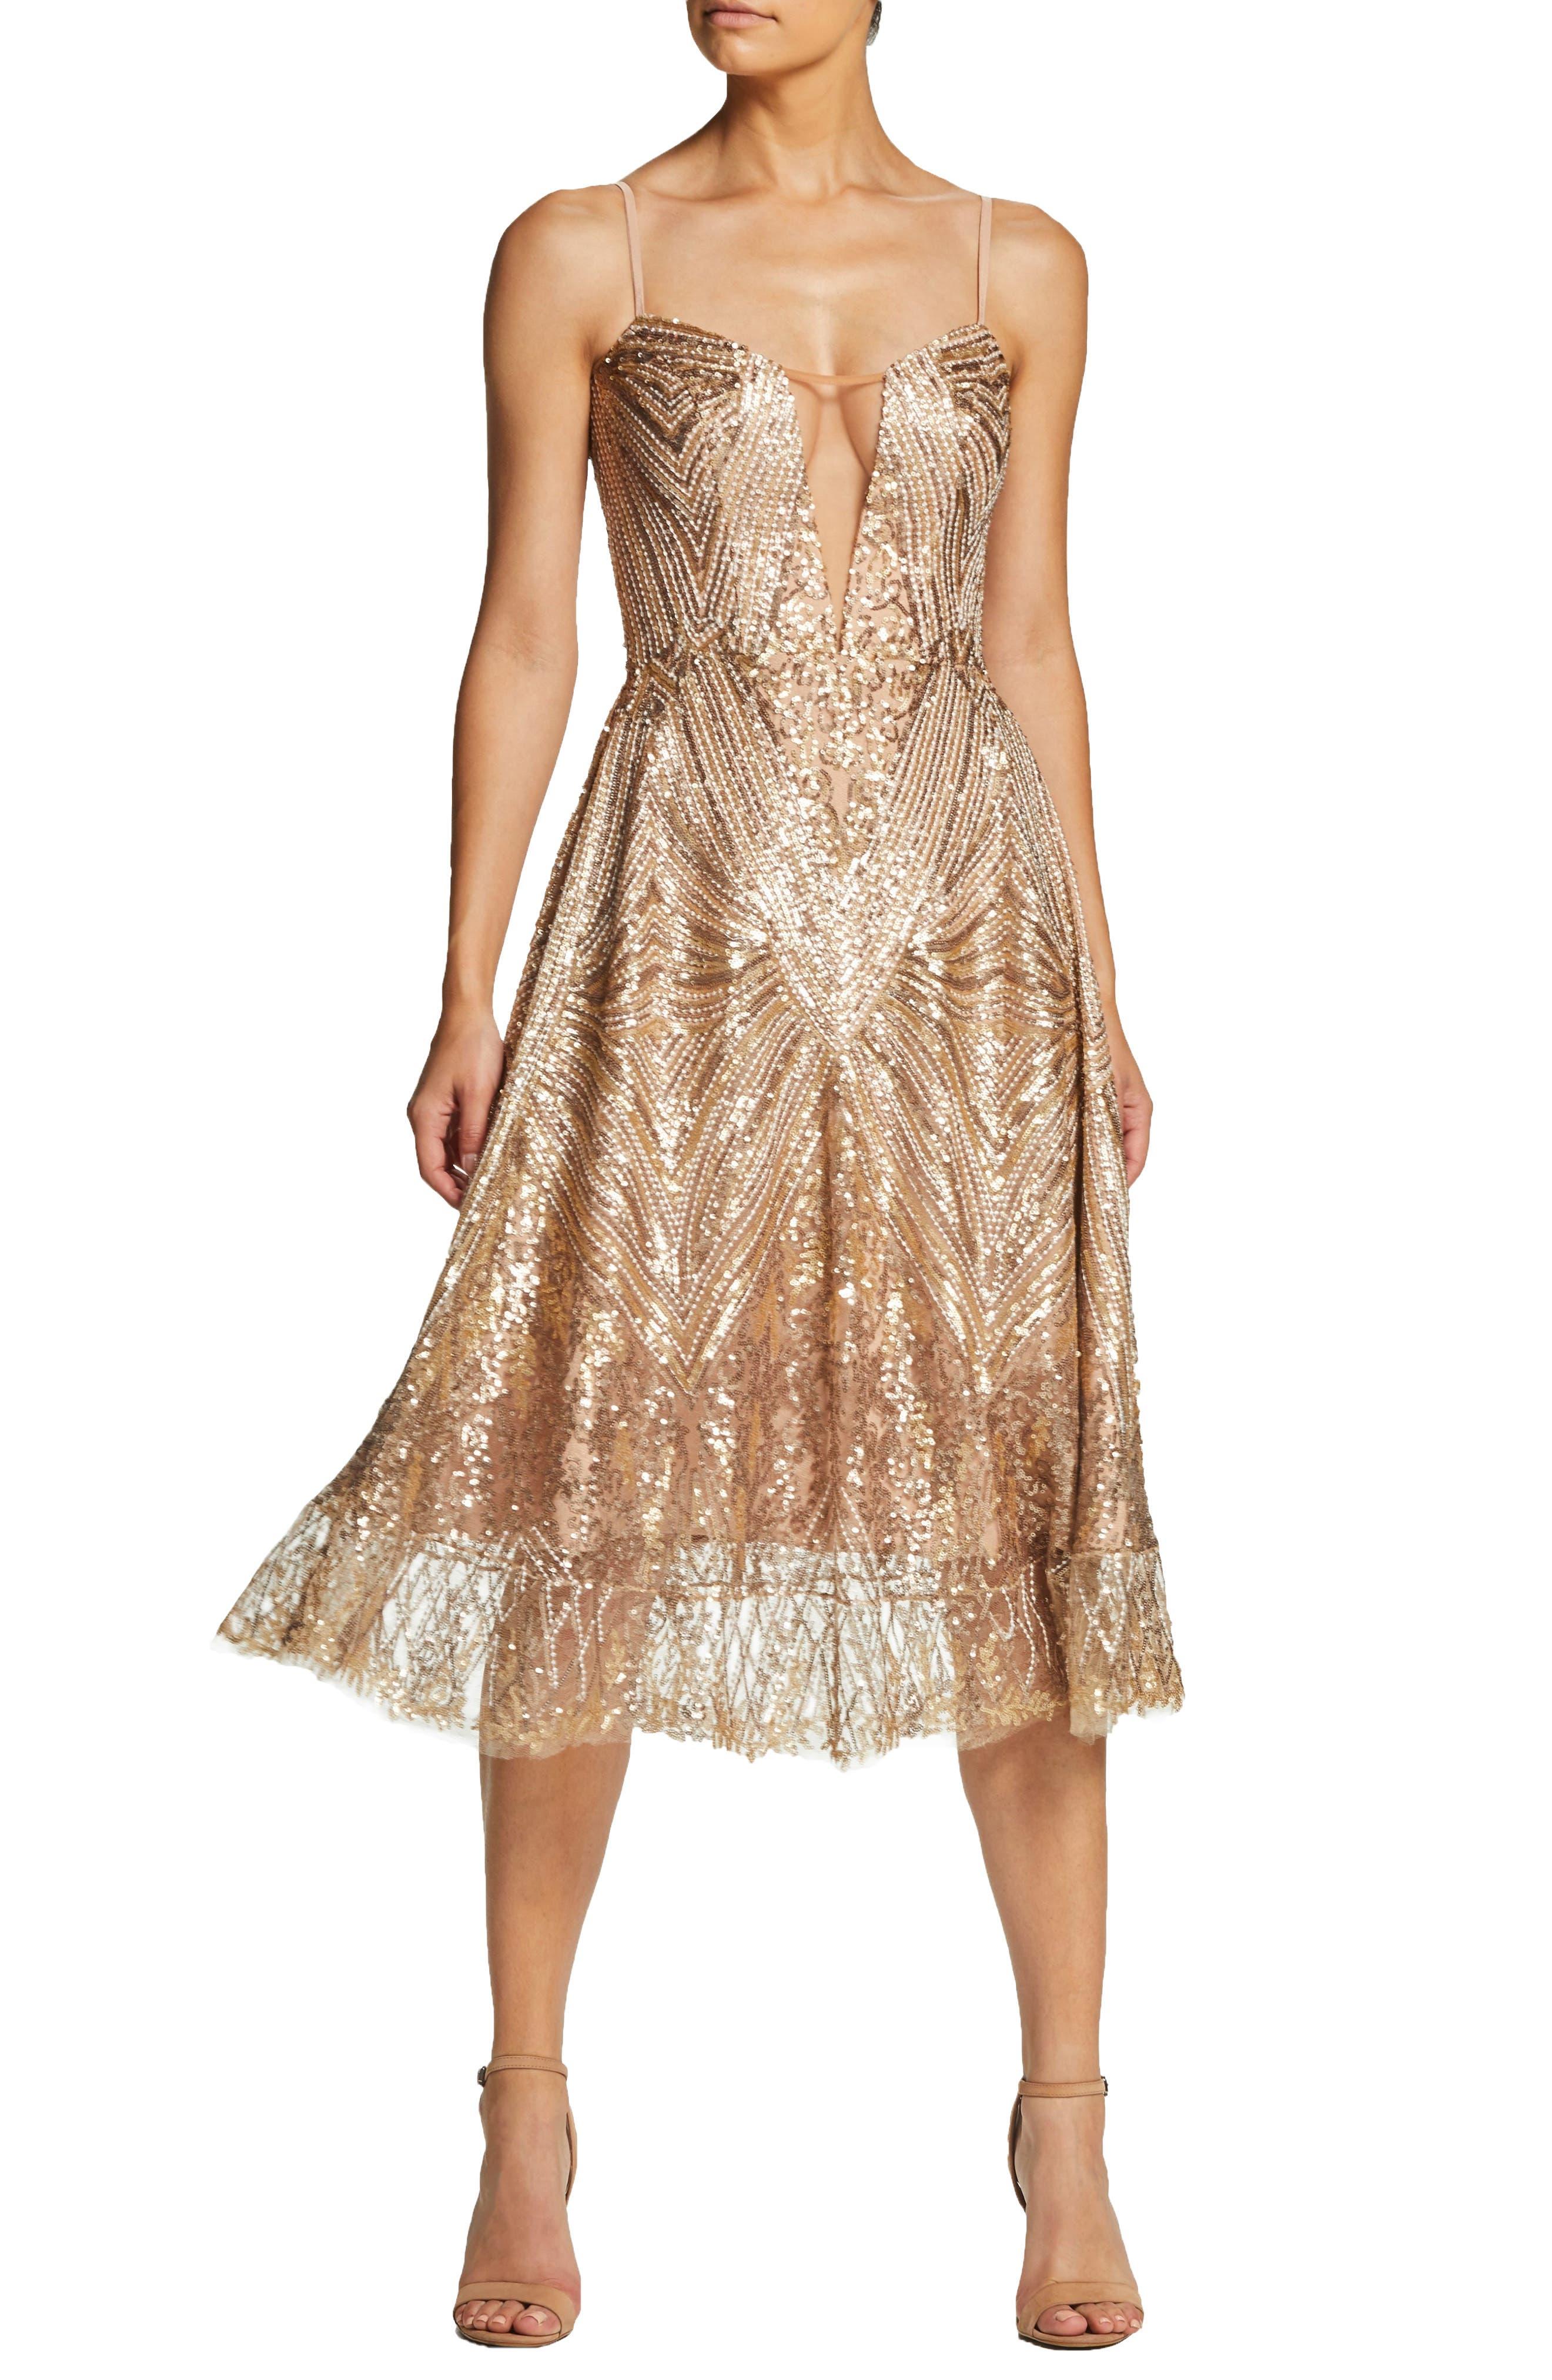 DRESS THE POPULATION,                             Leona Art Deco Sequin Fit & Flare Dress,                             Main thumbnail 1, color,                             GOLD/ BRASS